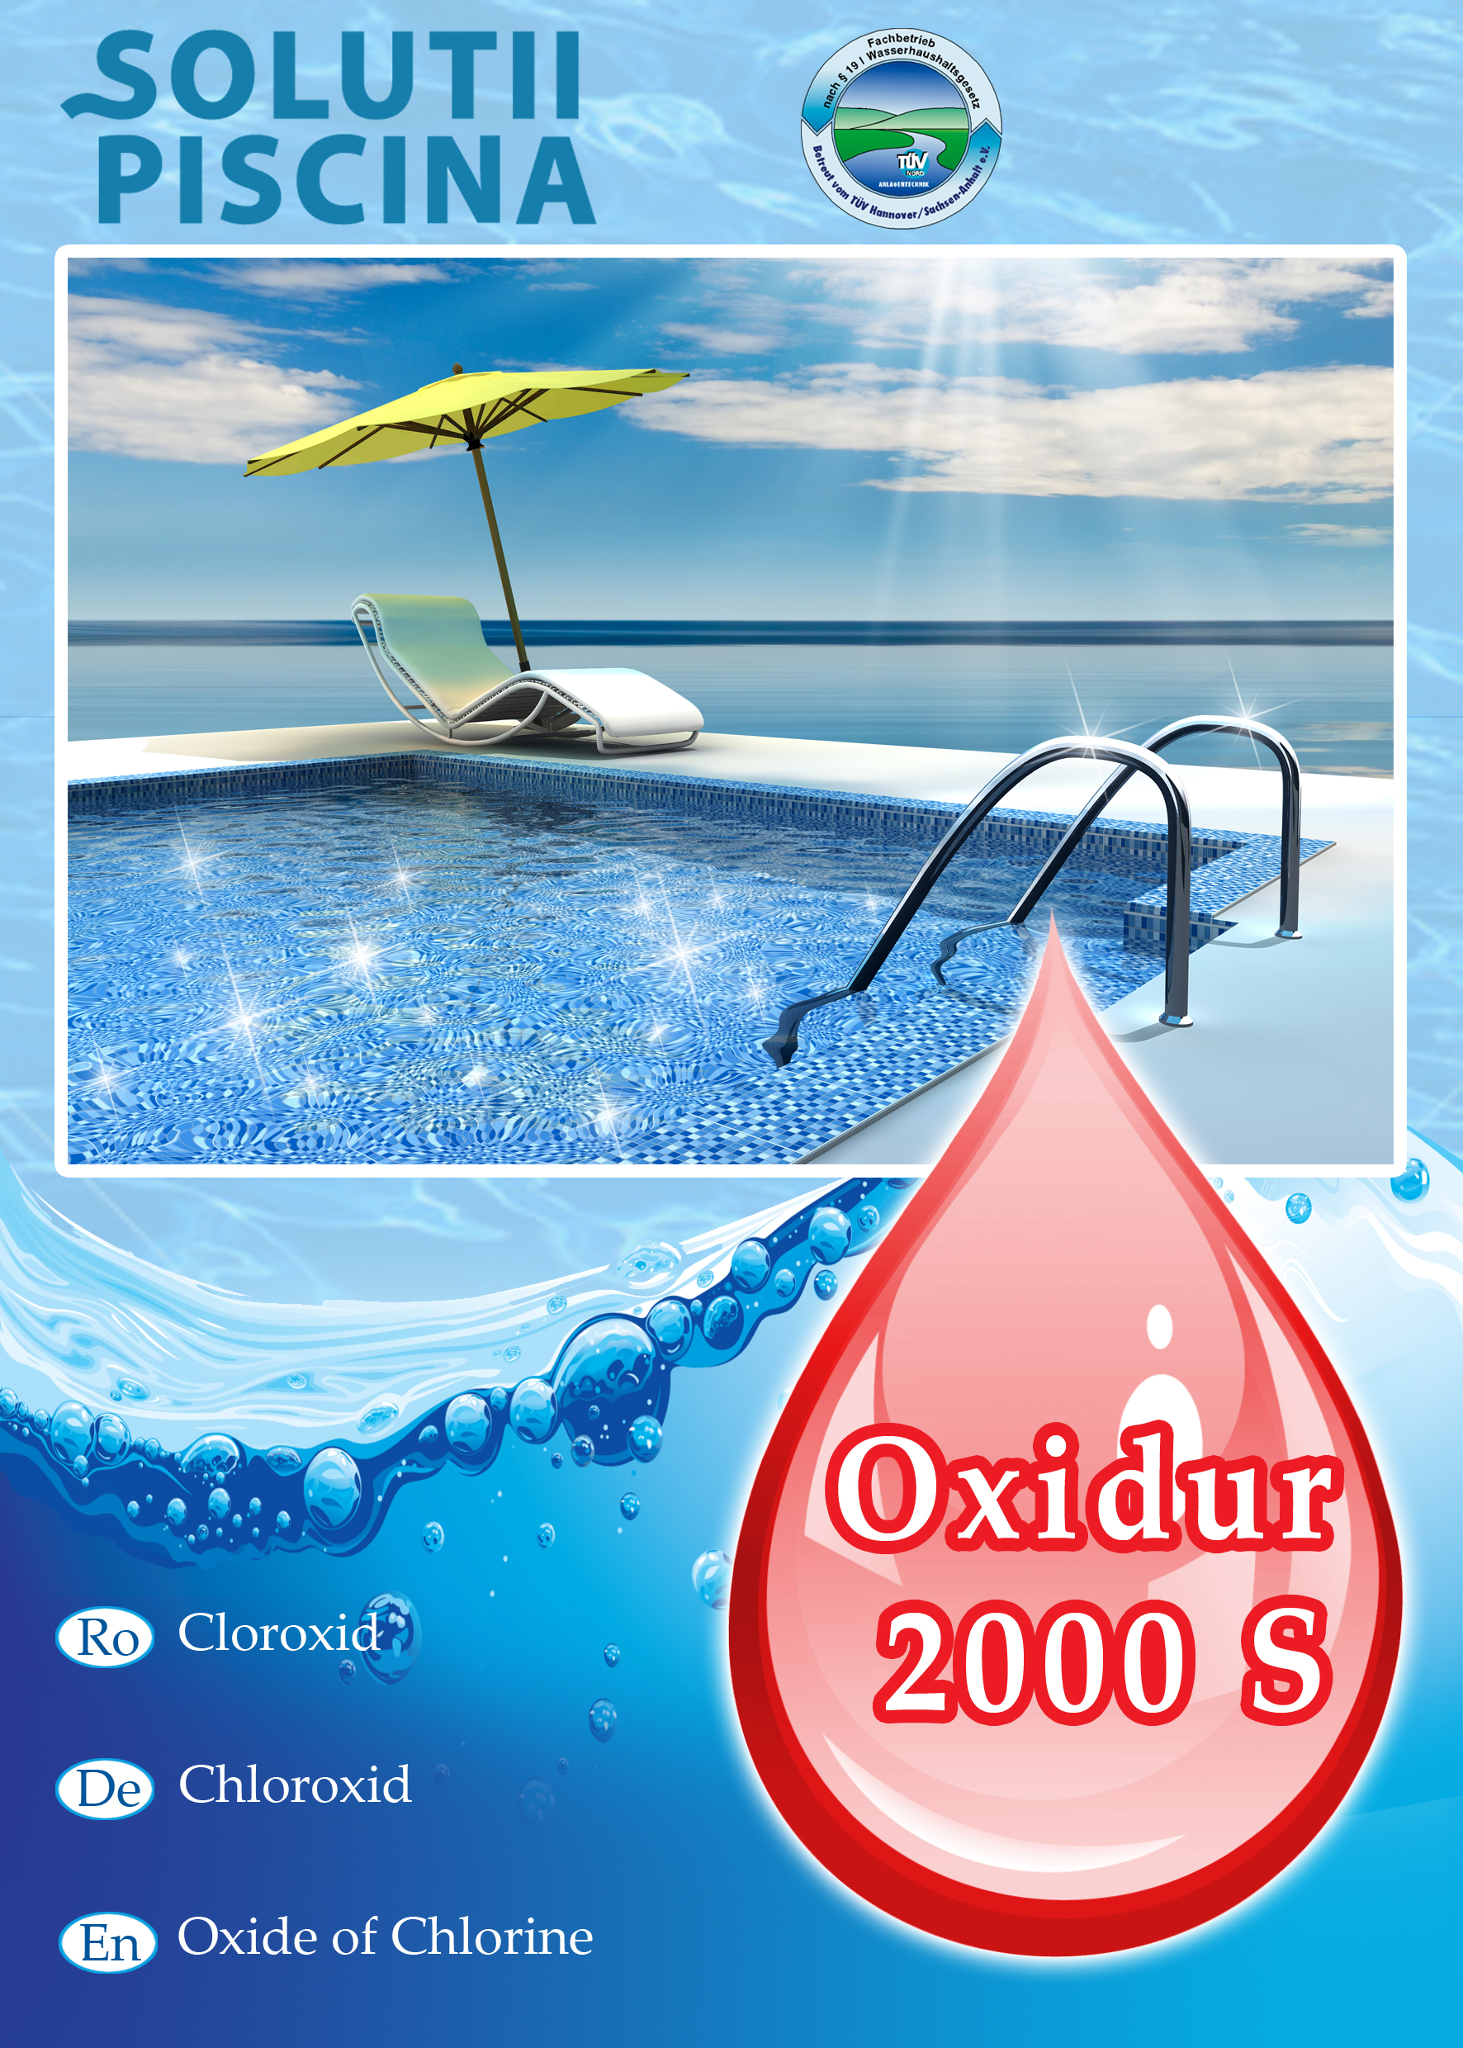 Oxidur 2000 S